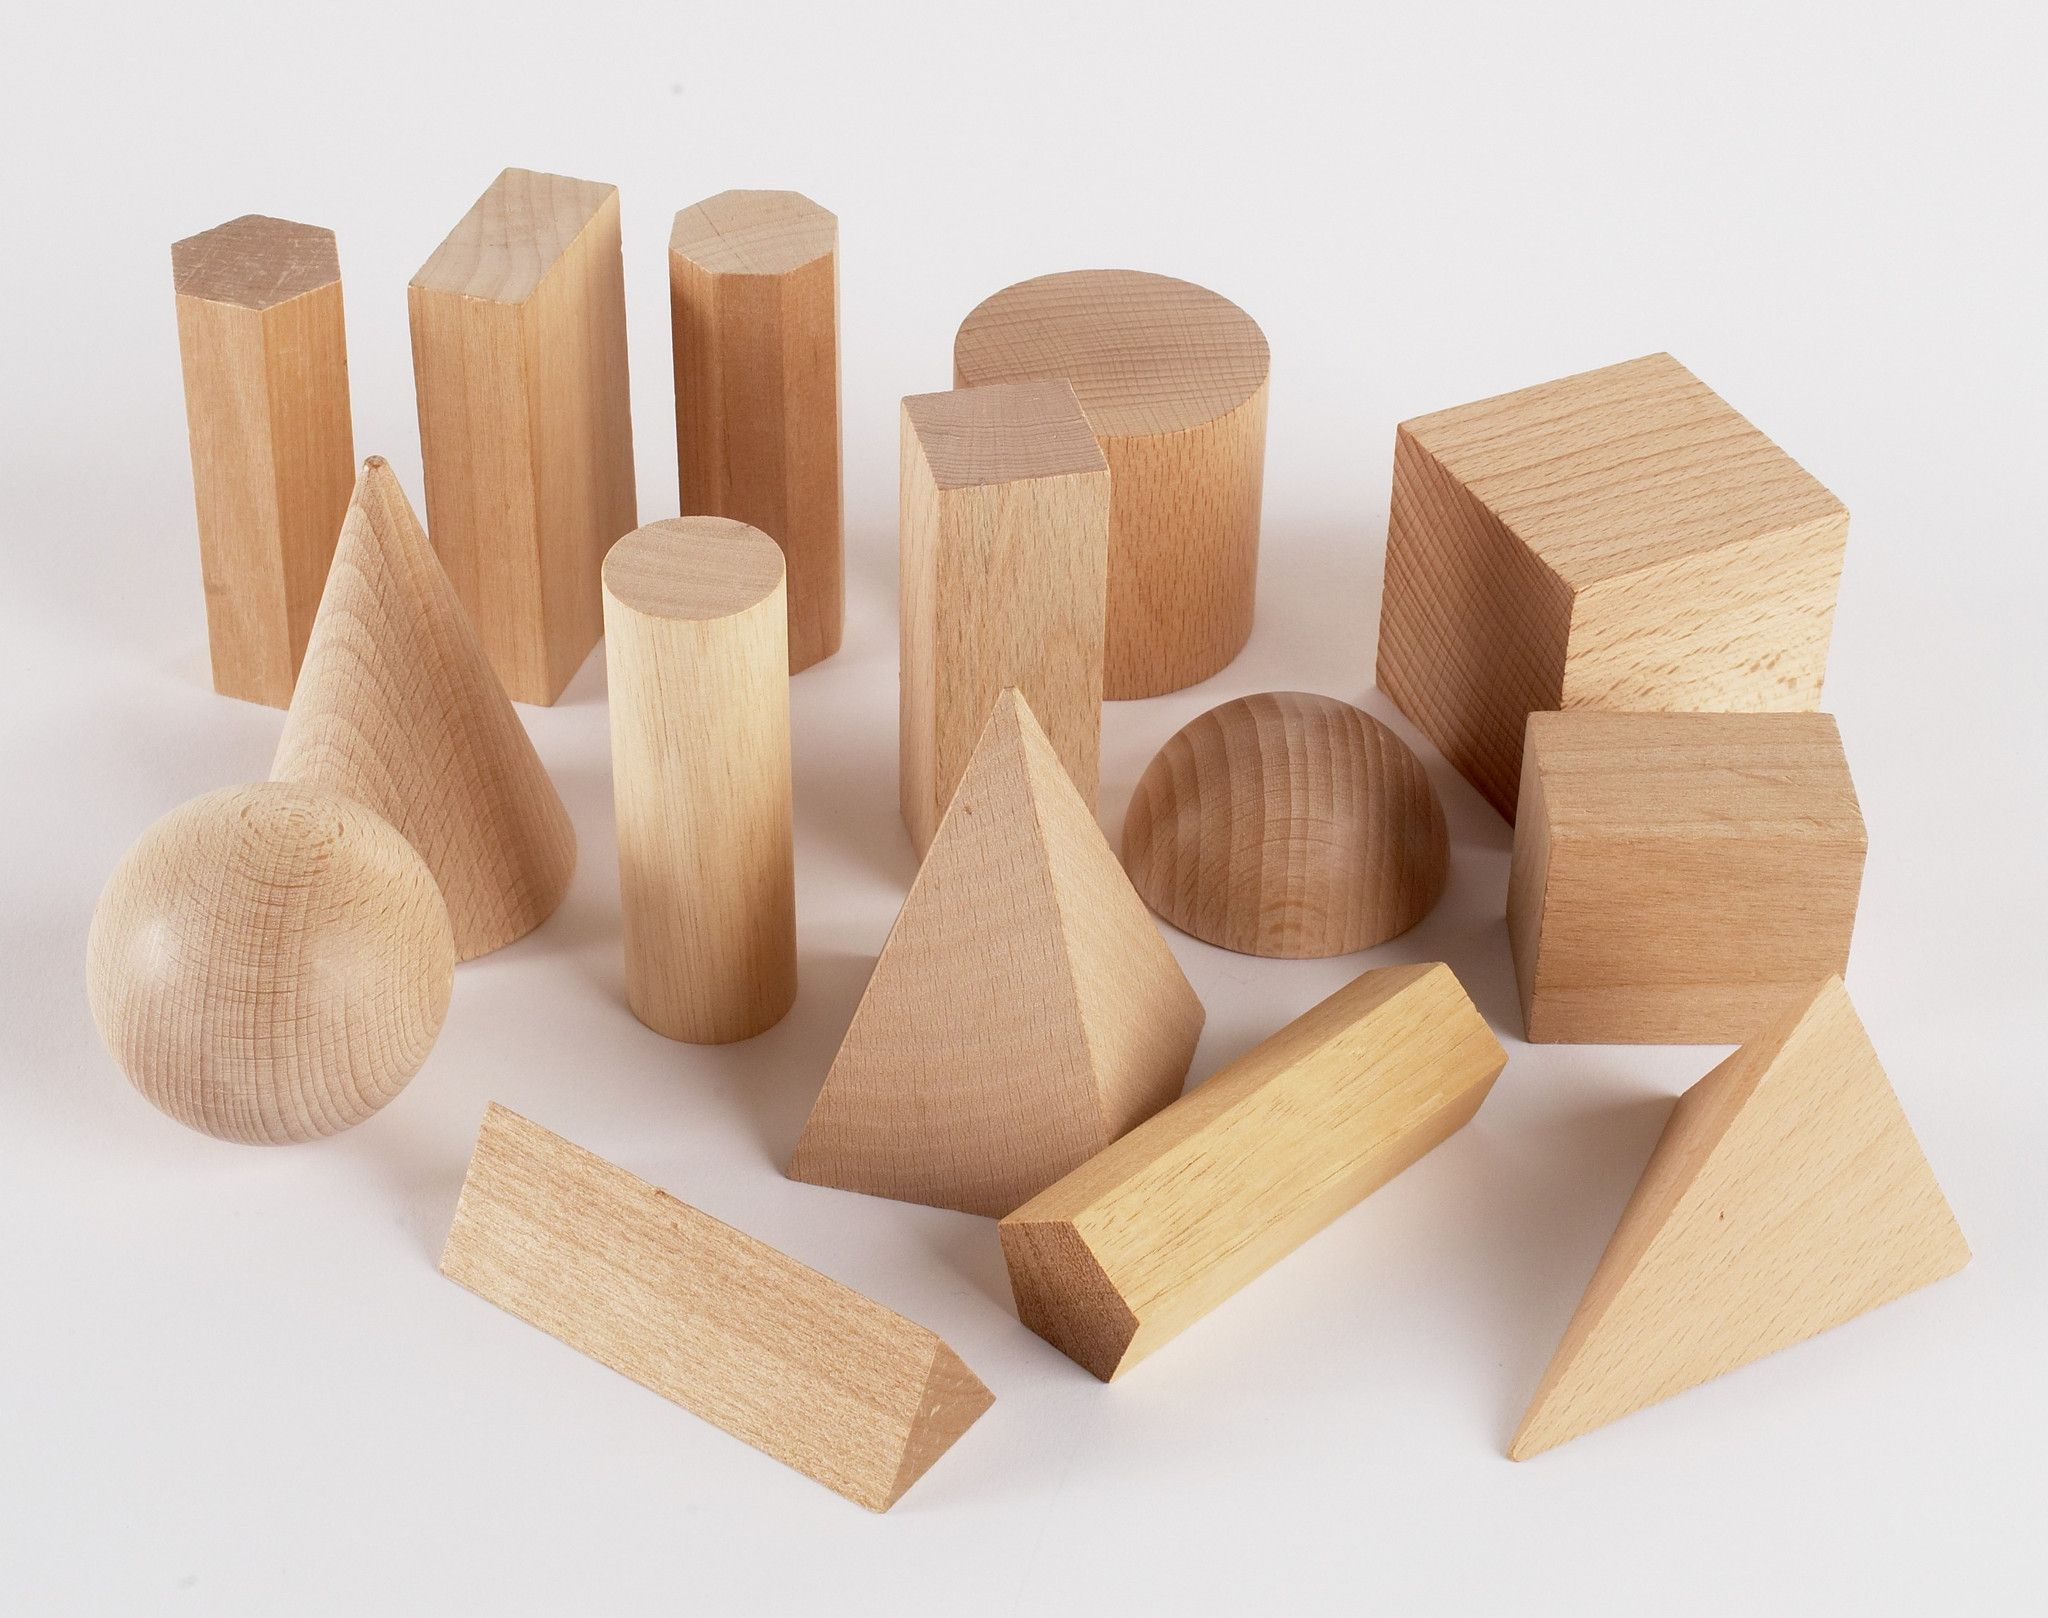 Wooden Geometric Solids